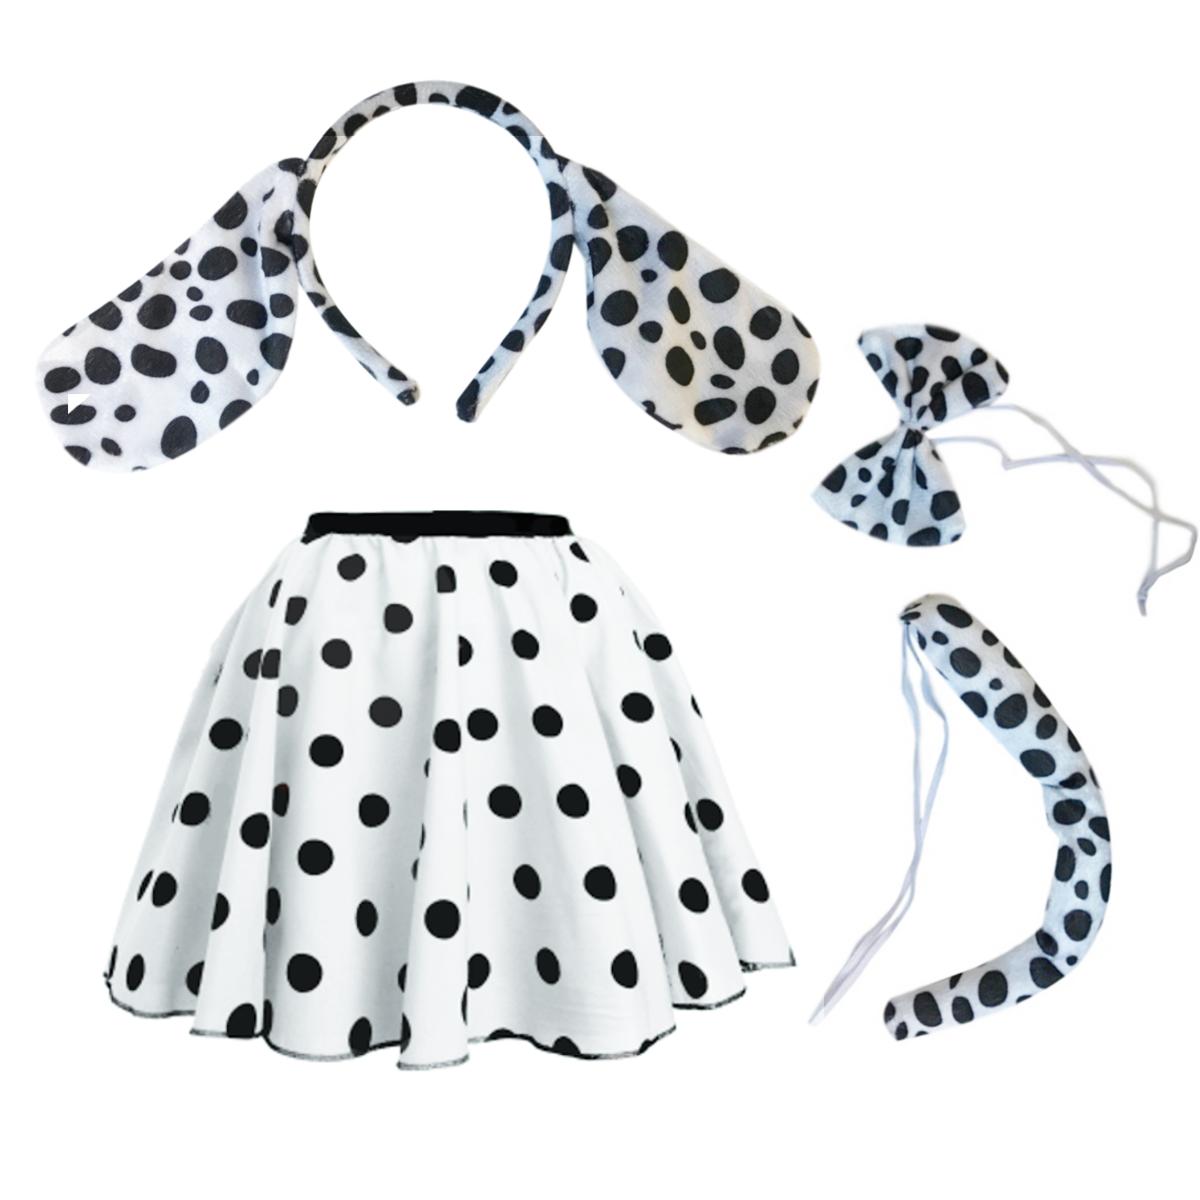 Dalmatian Darling Costume, sexy dalmatian costume - Yandy.com |Dalmation Dance Costume